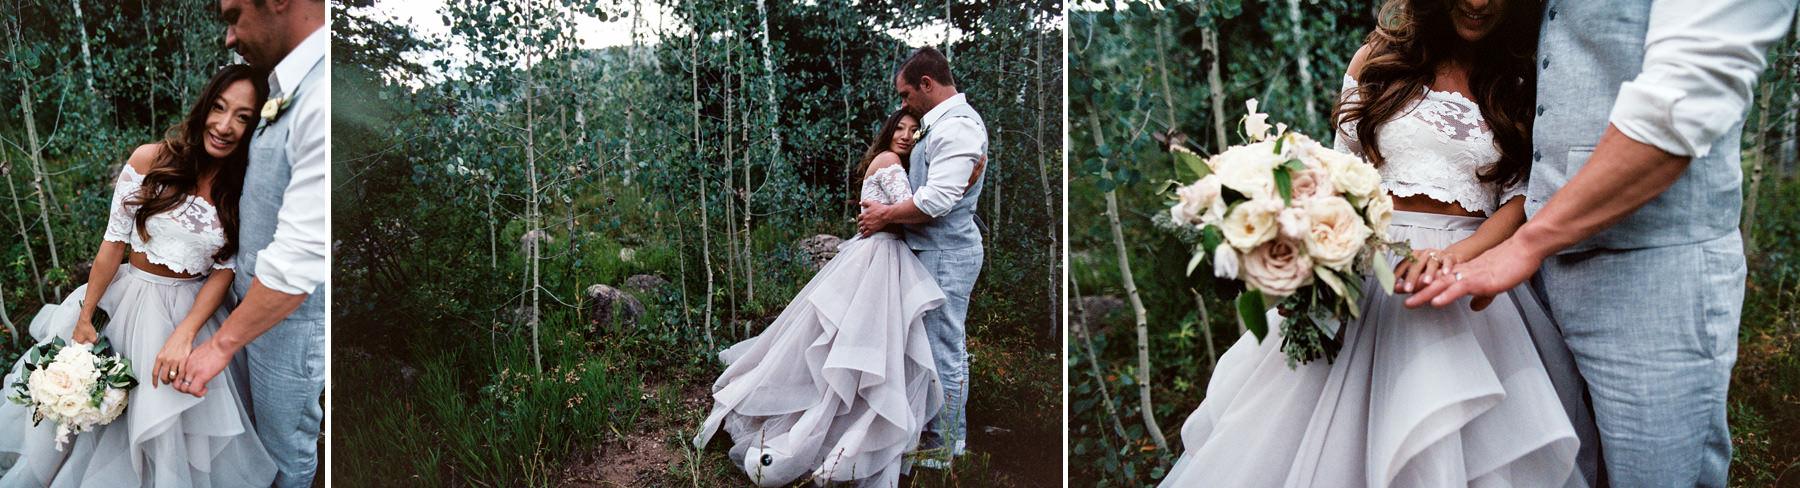 Vail Colorado Wedding Deck_ Kindling Wedding Photography108.JPG